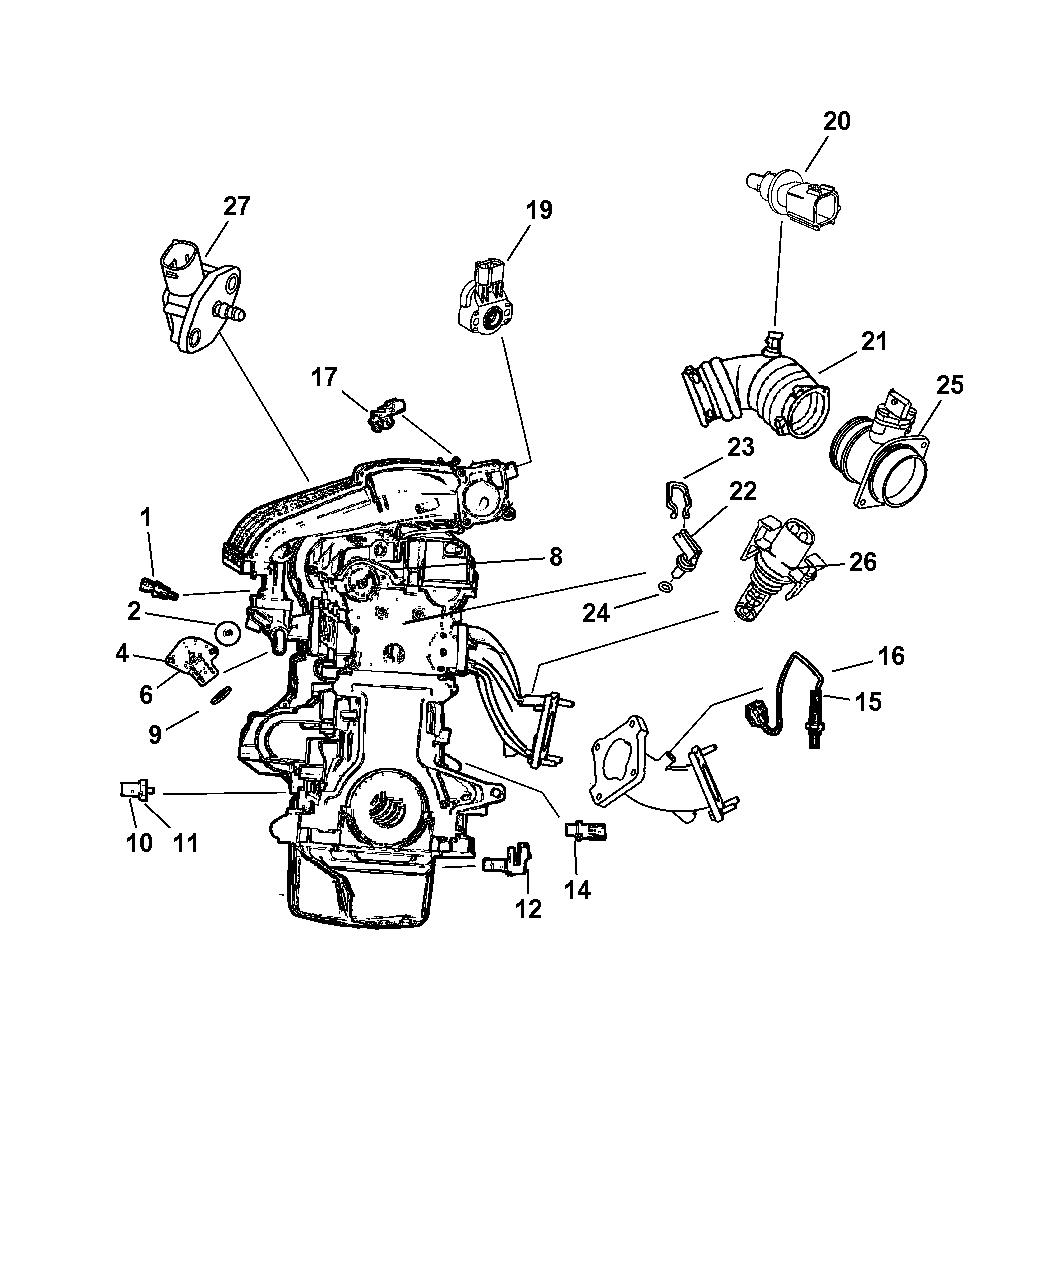 Genuine Chrysler SWITCH-OIL PRESSURE